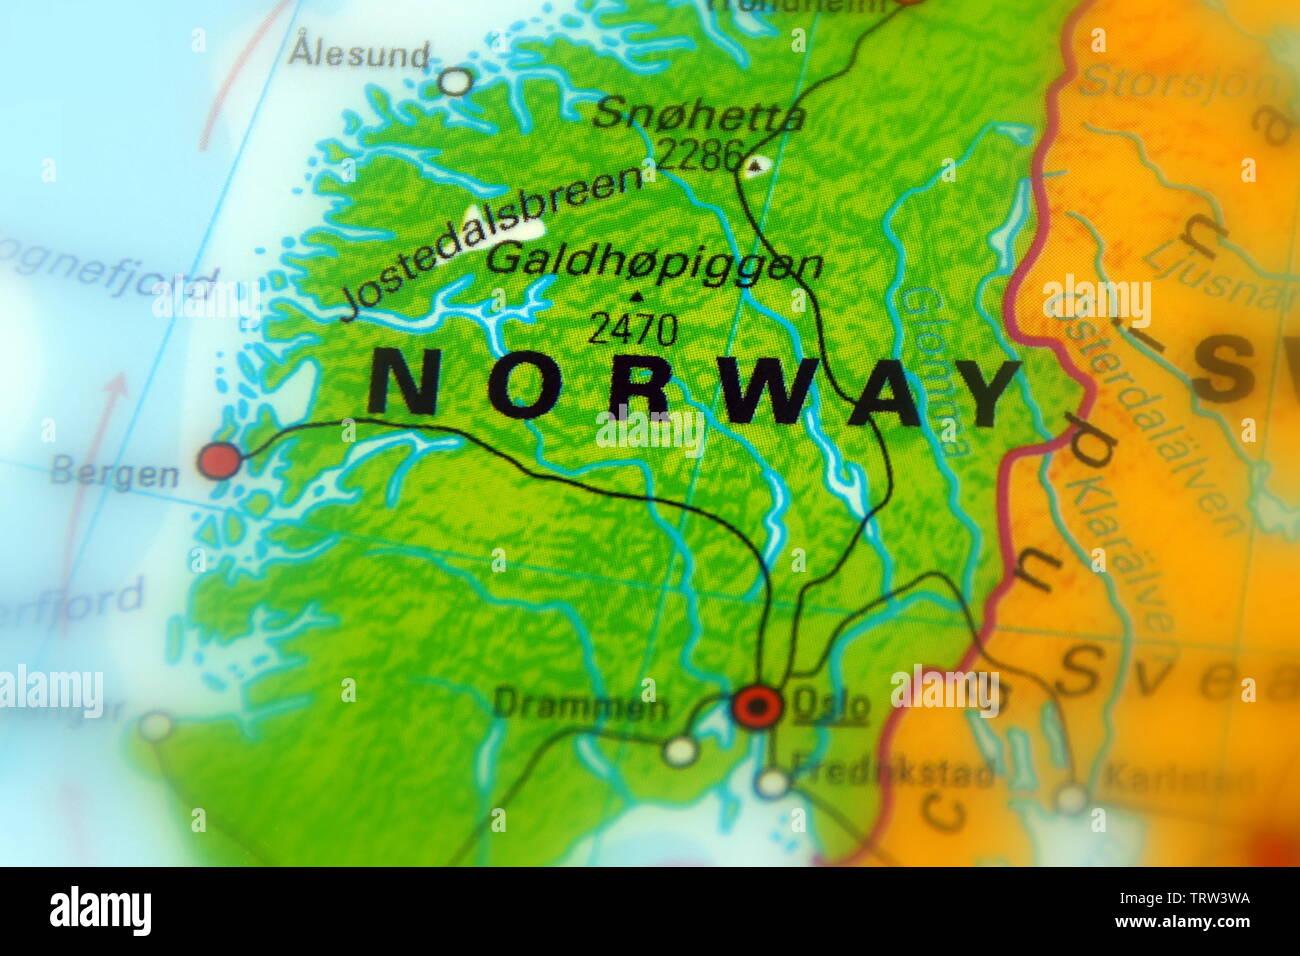 Cartina Politica Norvegia.Mappa Politica Scandinavia Immagini E Fotos Stock Alamy